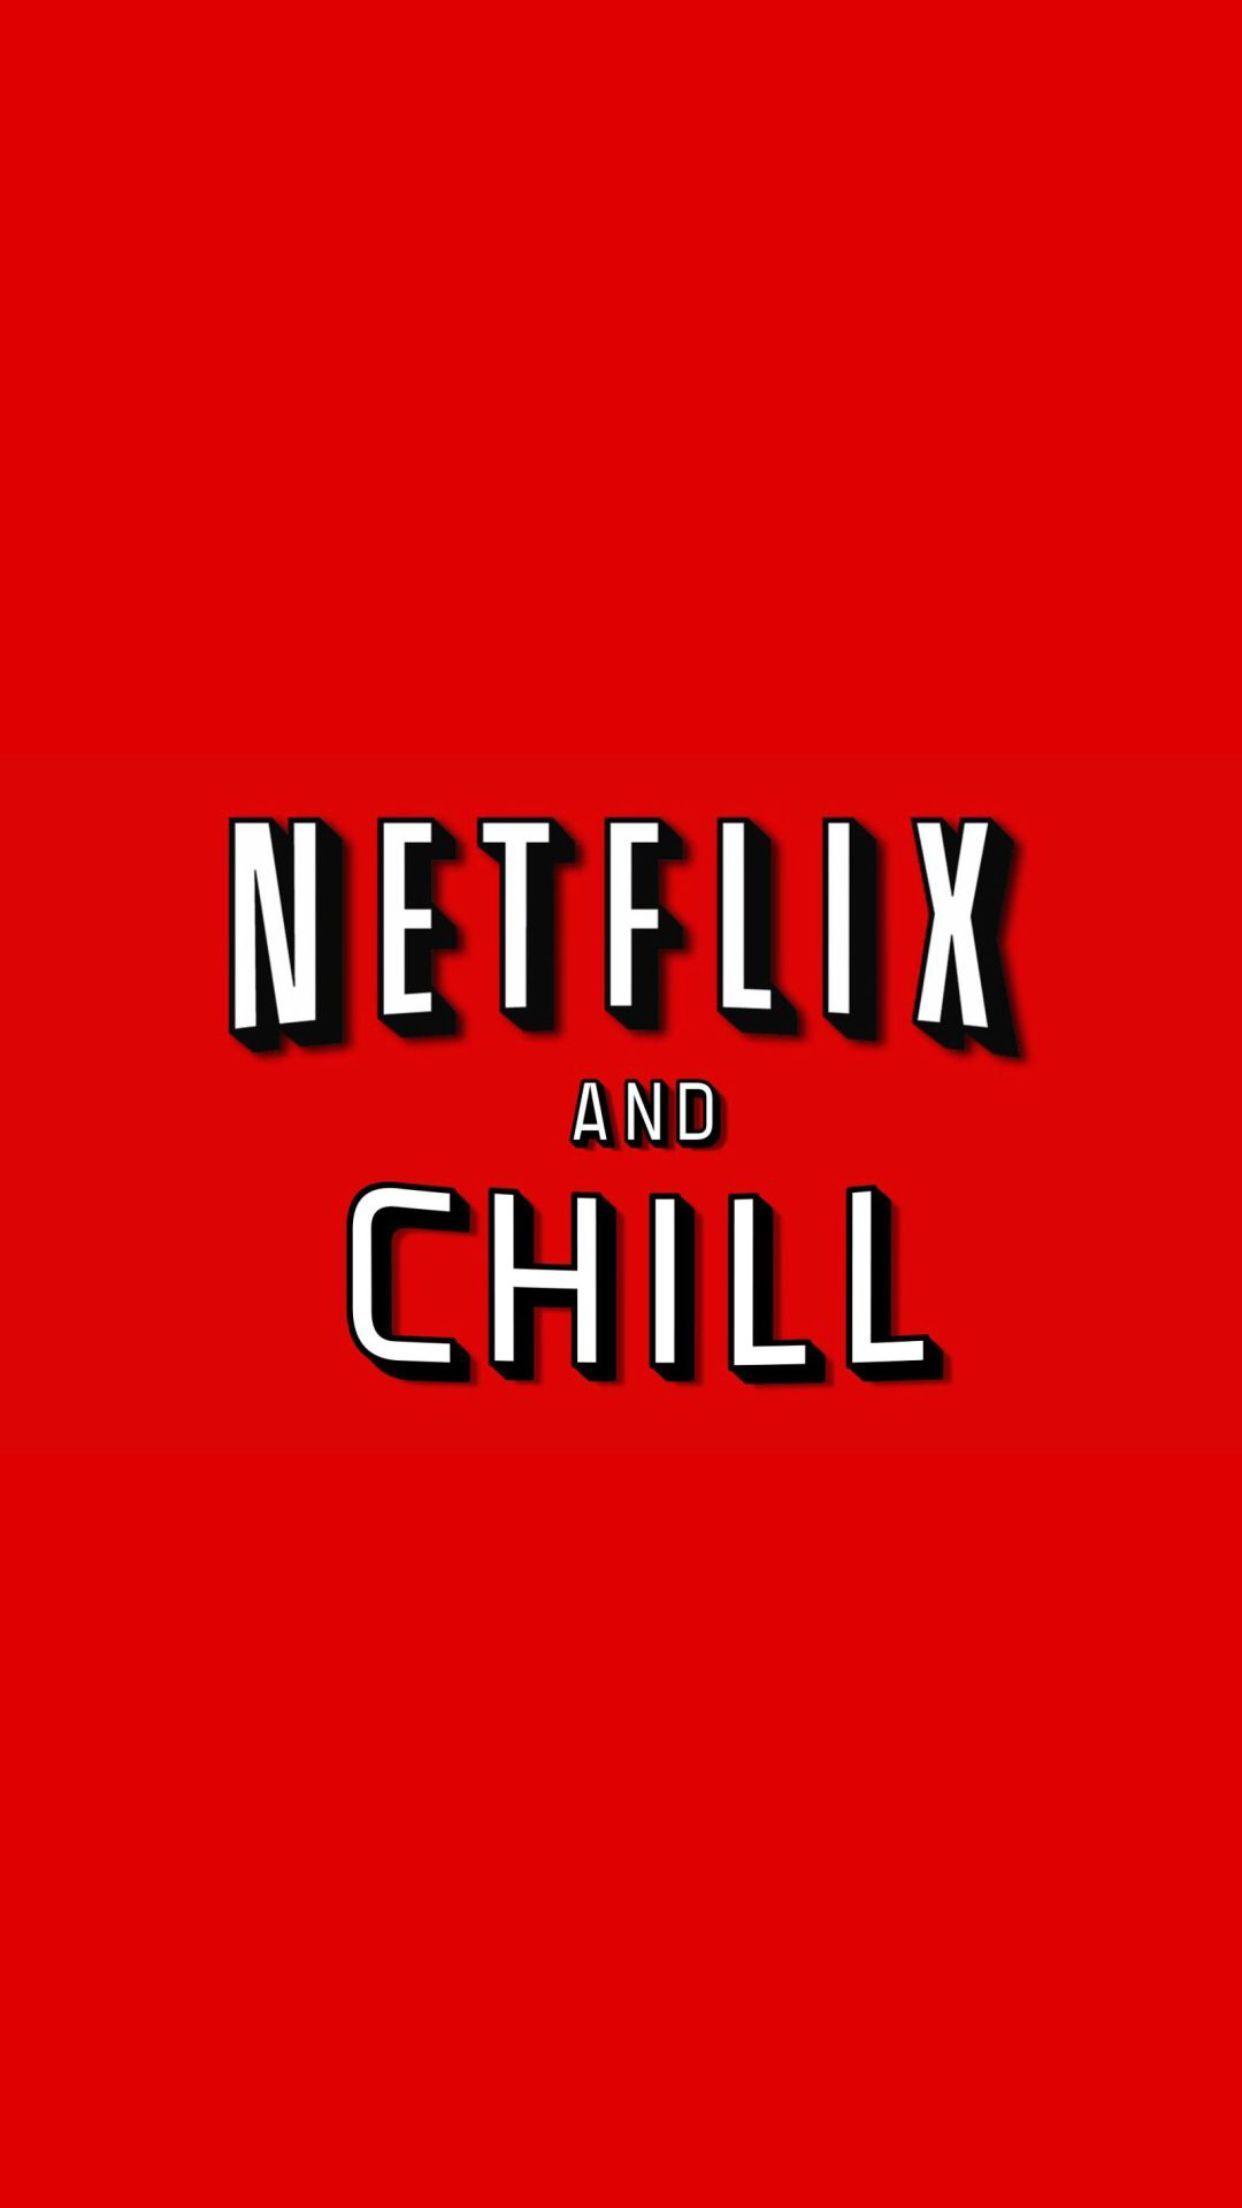 Sounds Good To Me Fondodepantalla3diphone Good Sounds Chill Wallpaper Netflix Wall Paper Phone